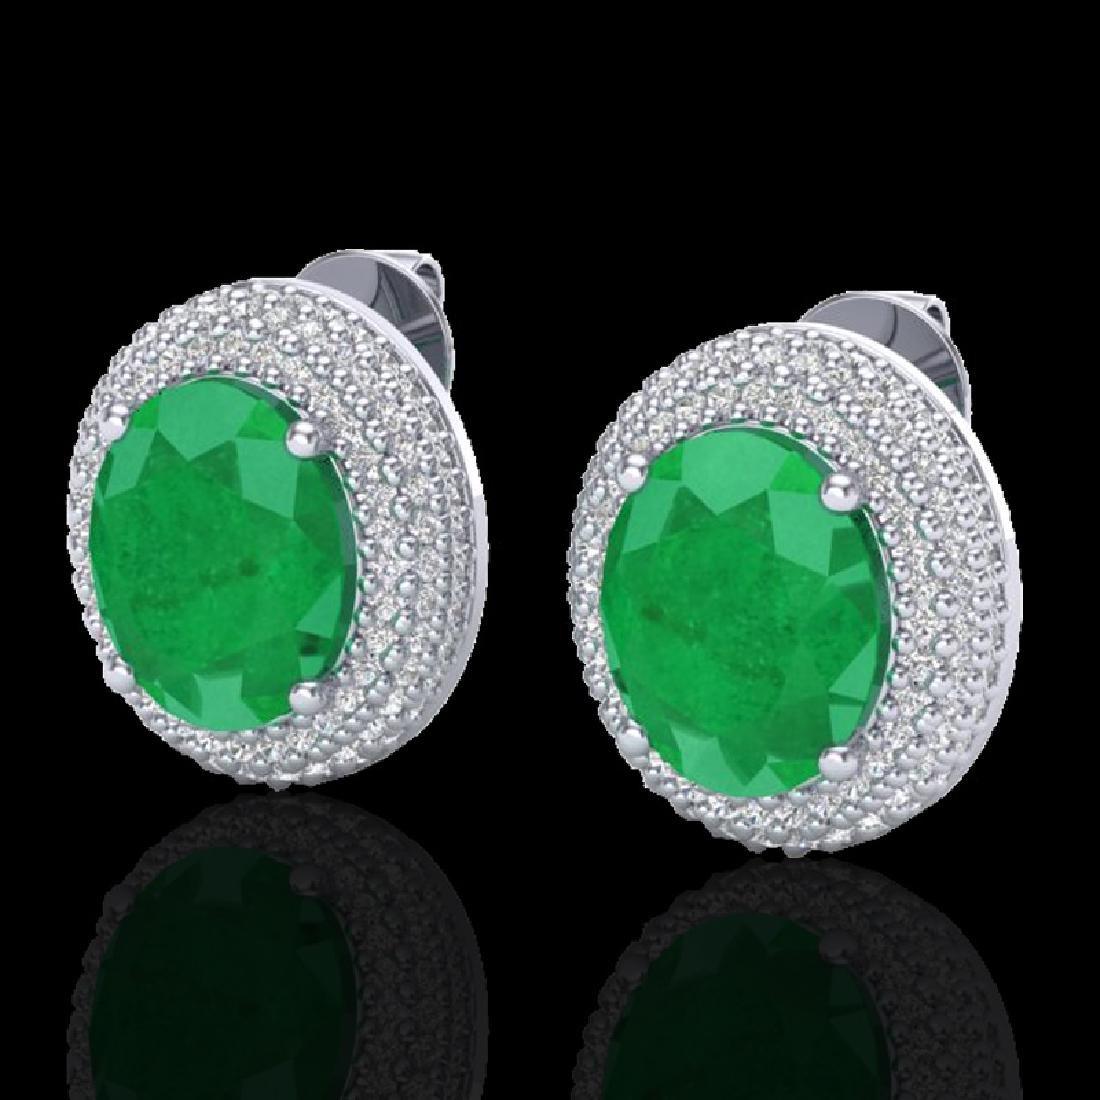 9.20 CTW Emerald & Micro Pave VS/SI Diamond Earrings